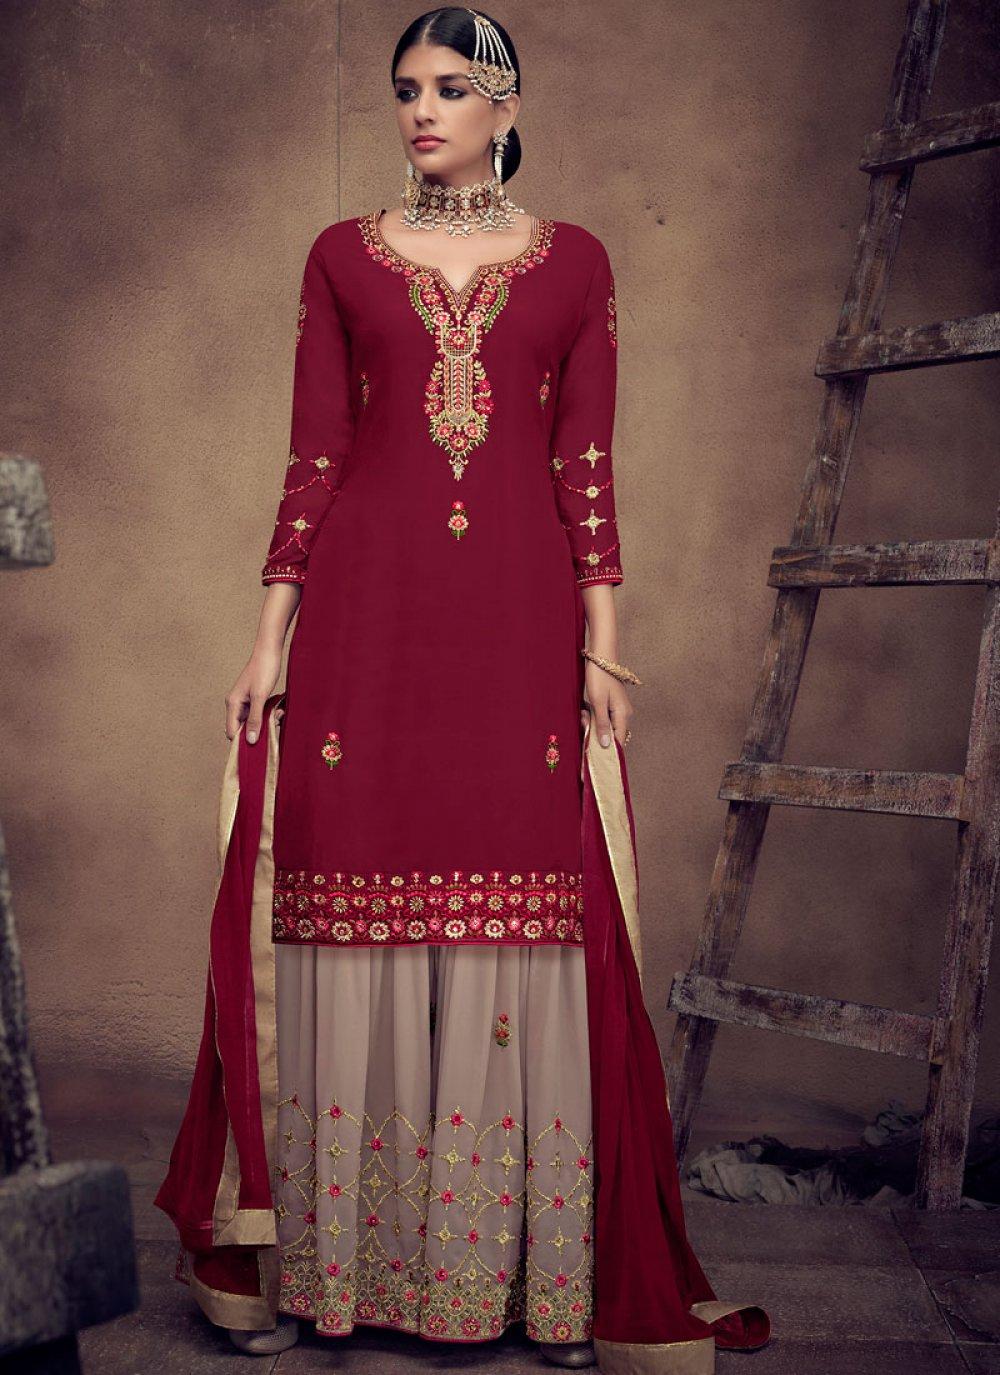 Embroidered Faux Georgette Palazzo Designer Salwar Kameez in Maroon